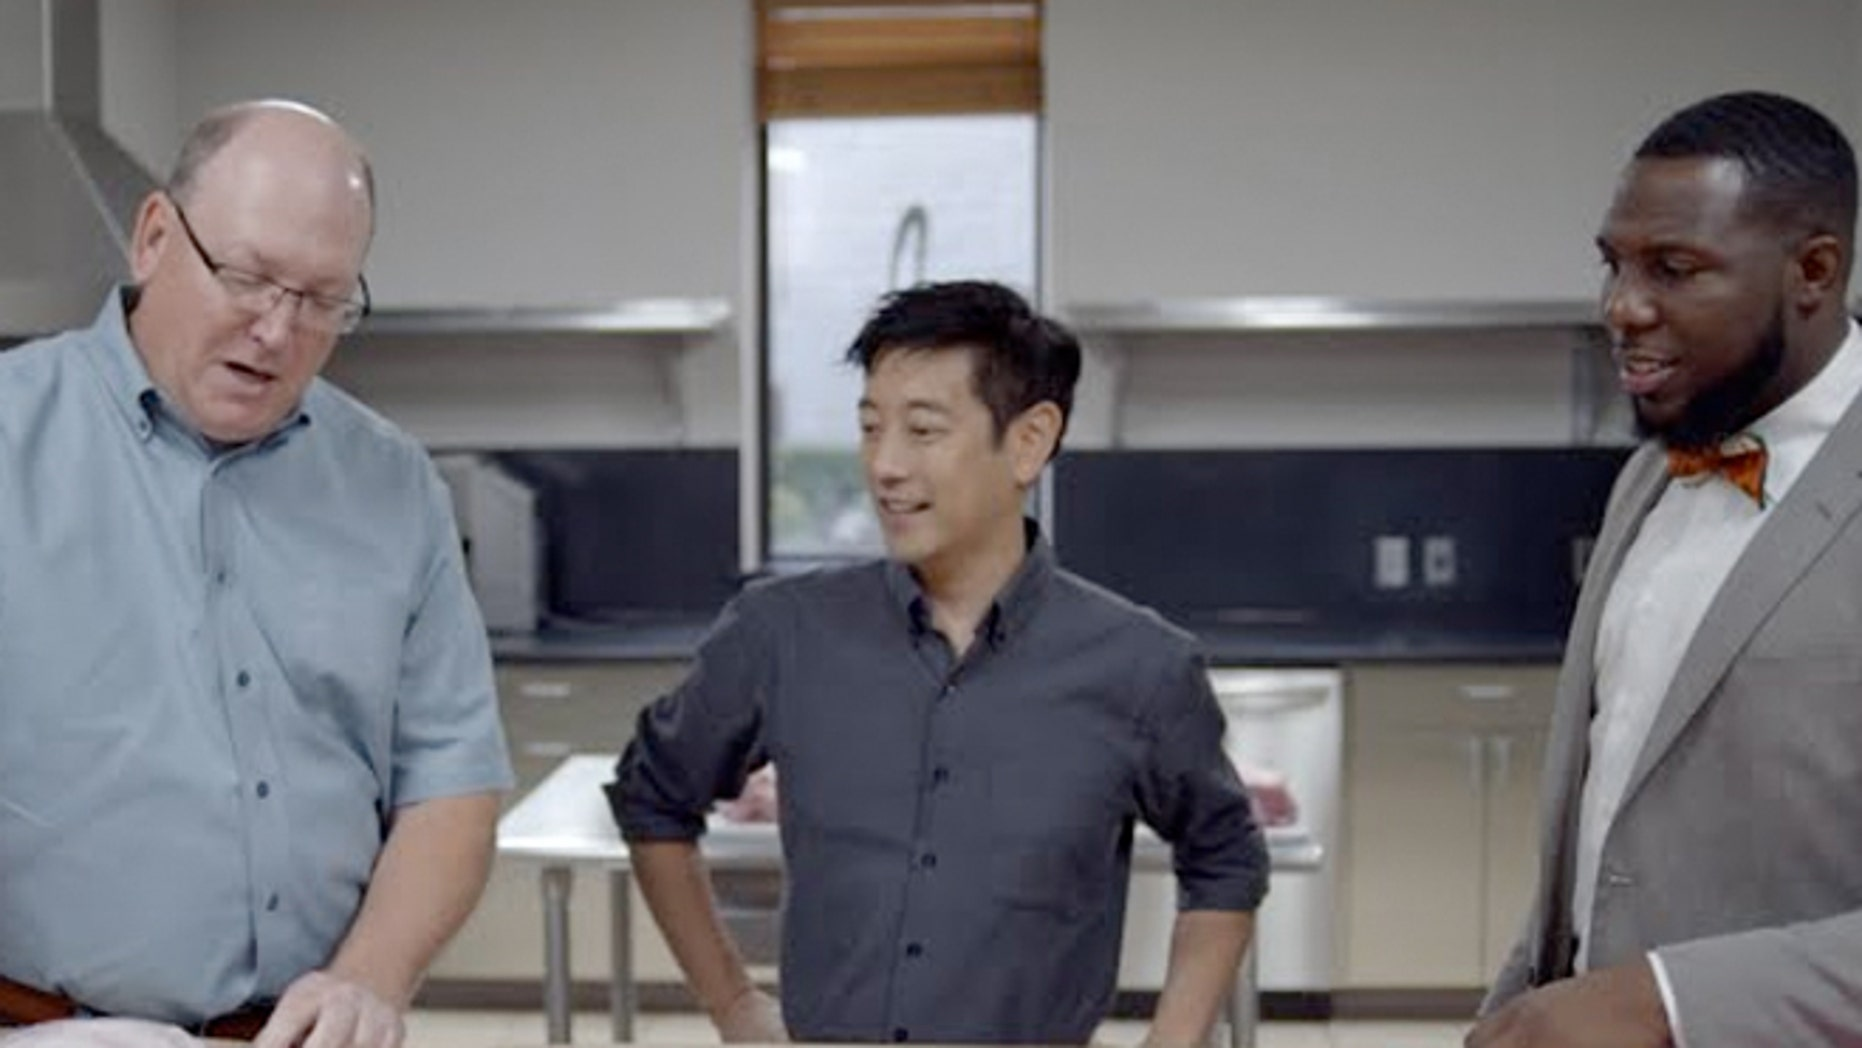 Grant Imahara and McRib skeptic are trying to debunk myths about McDonald's elusive McRib.